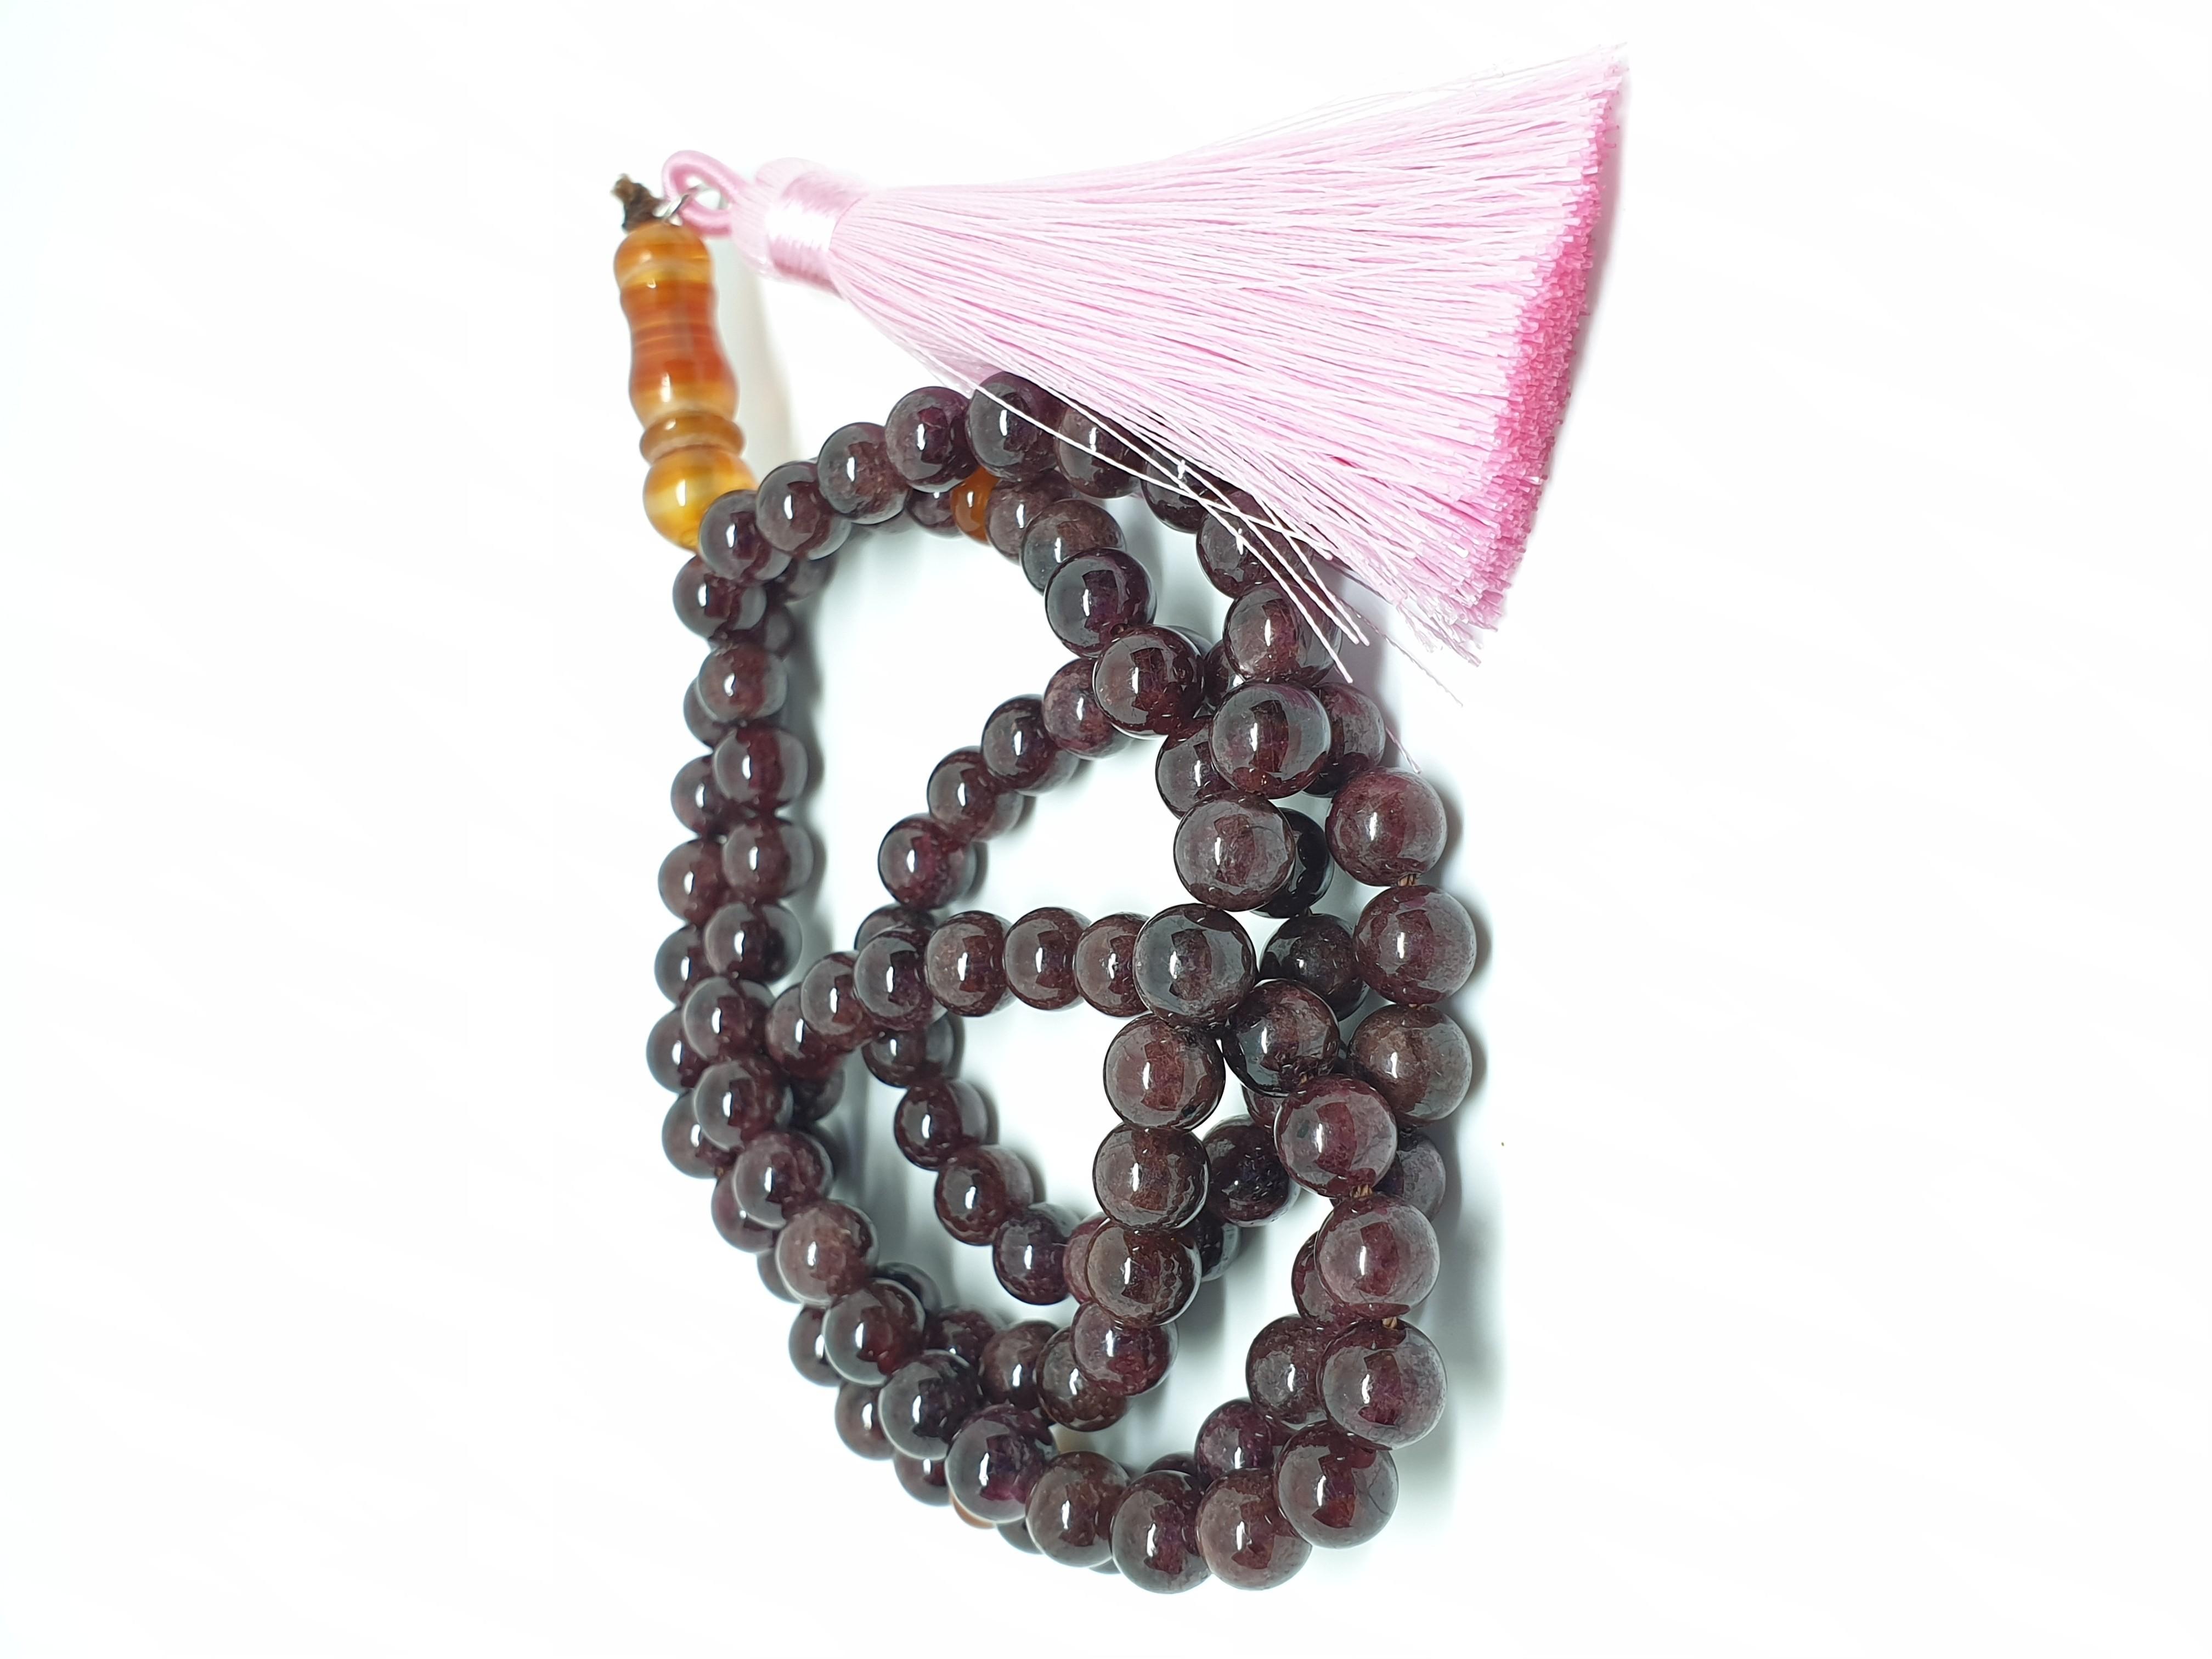 Misbaha of Garnet Stone